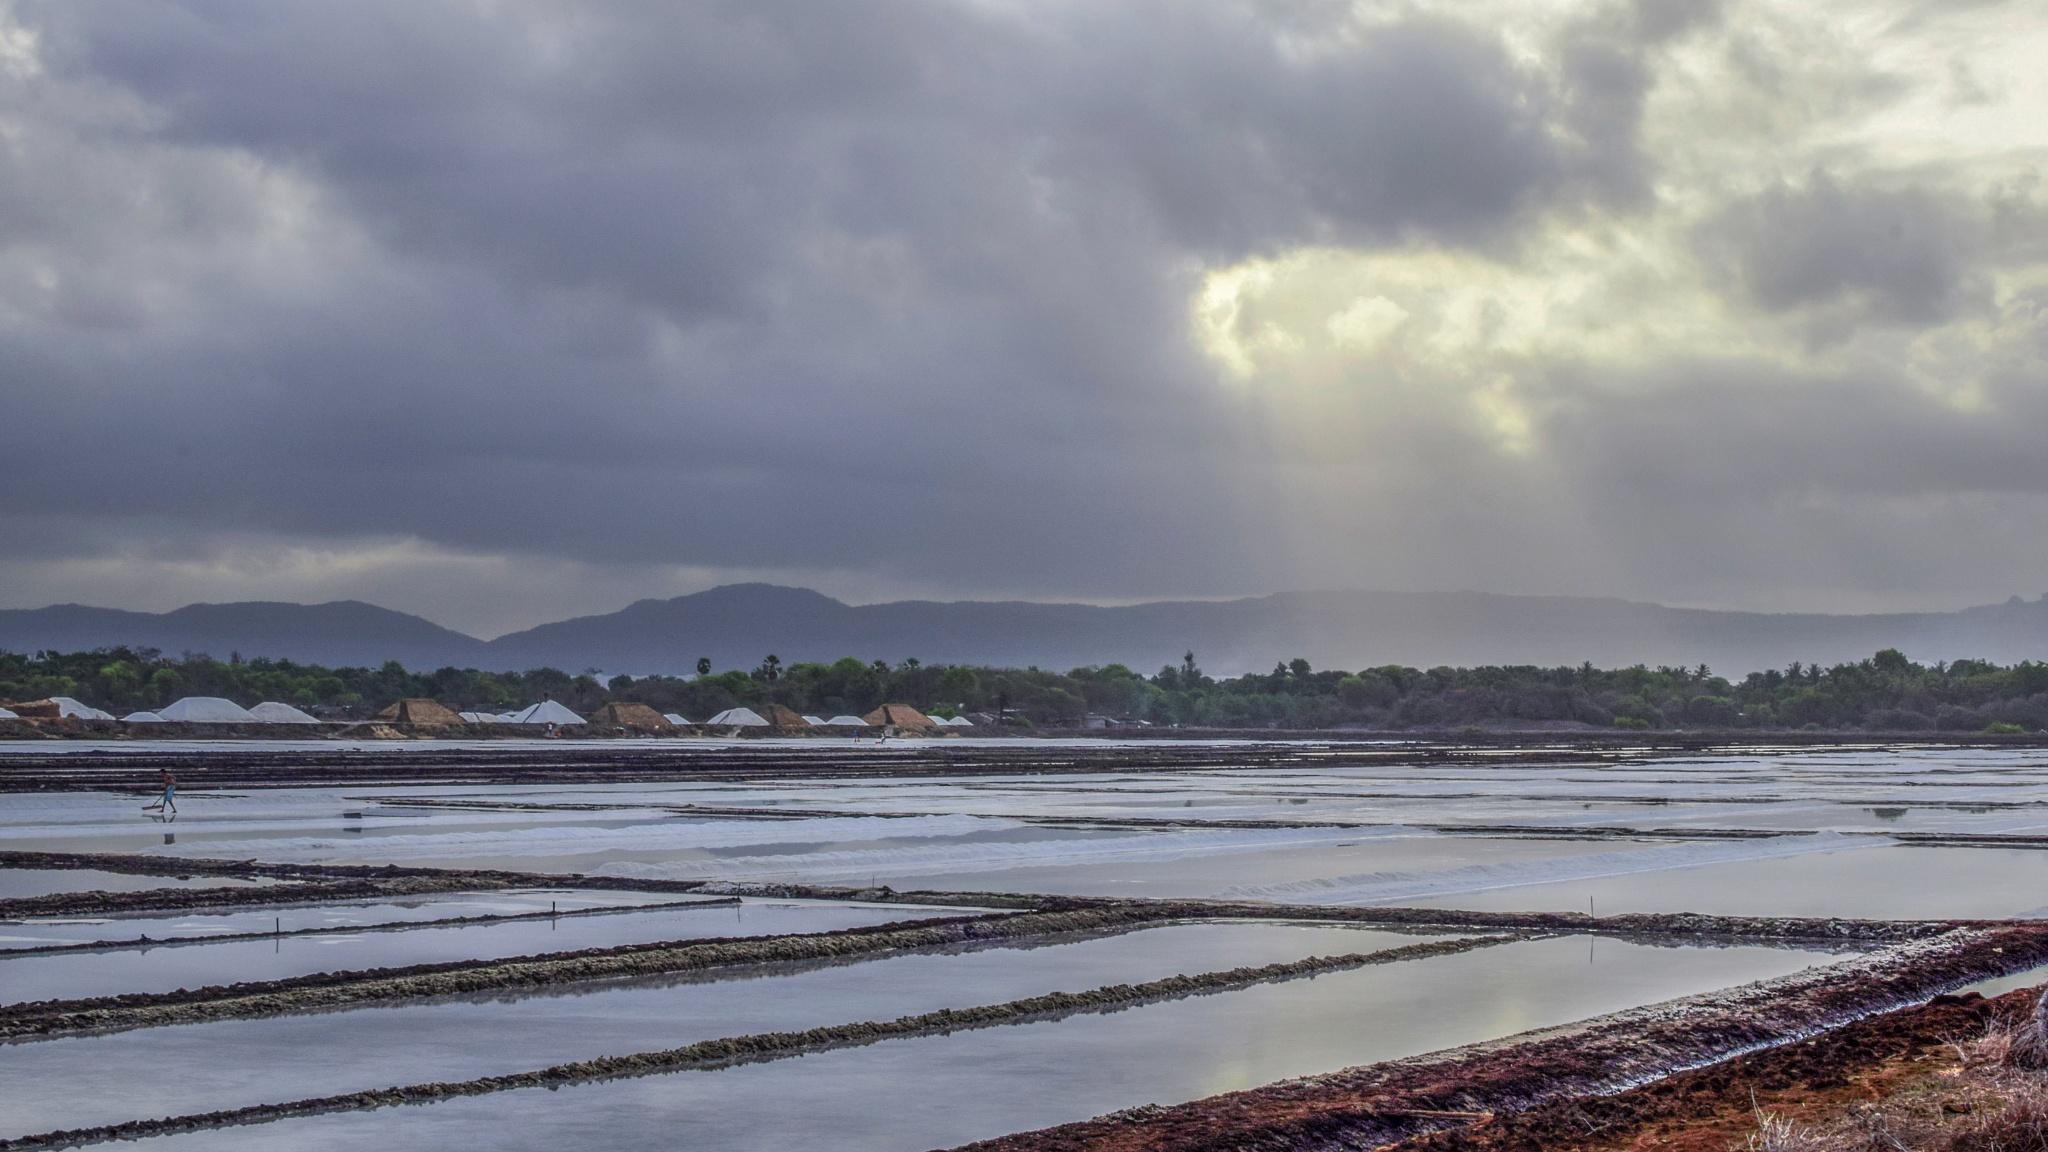 Ray of hope by Prasad Dalvi